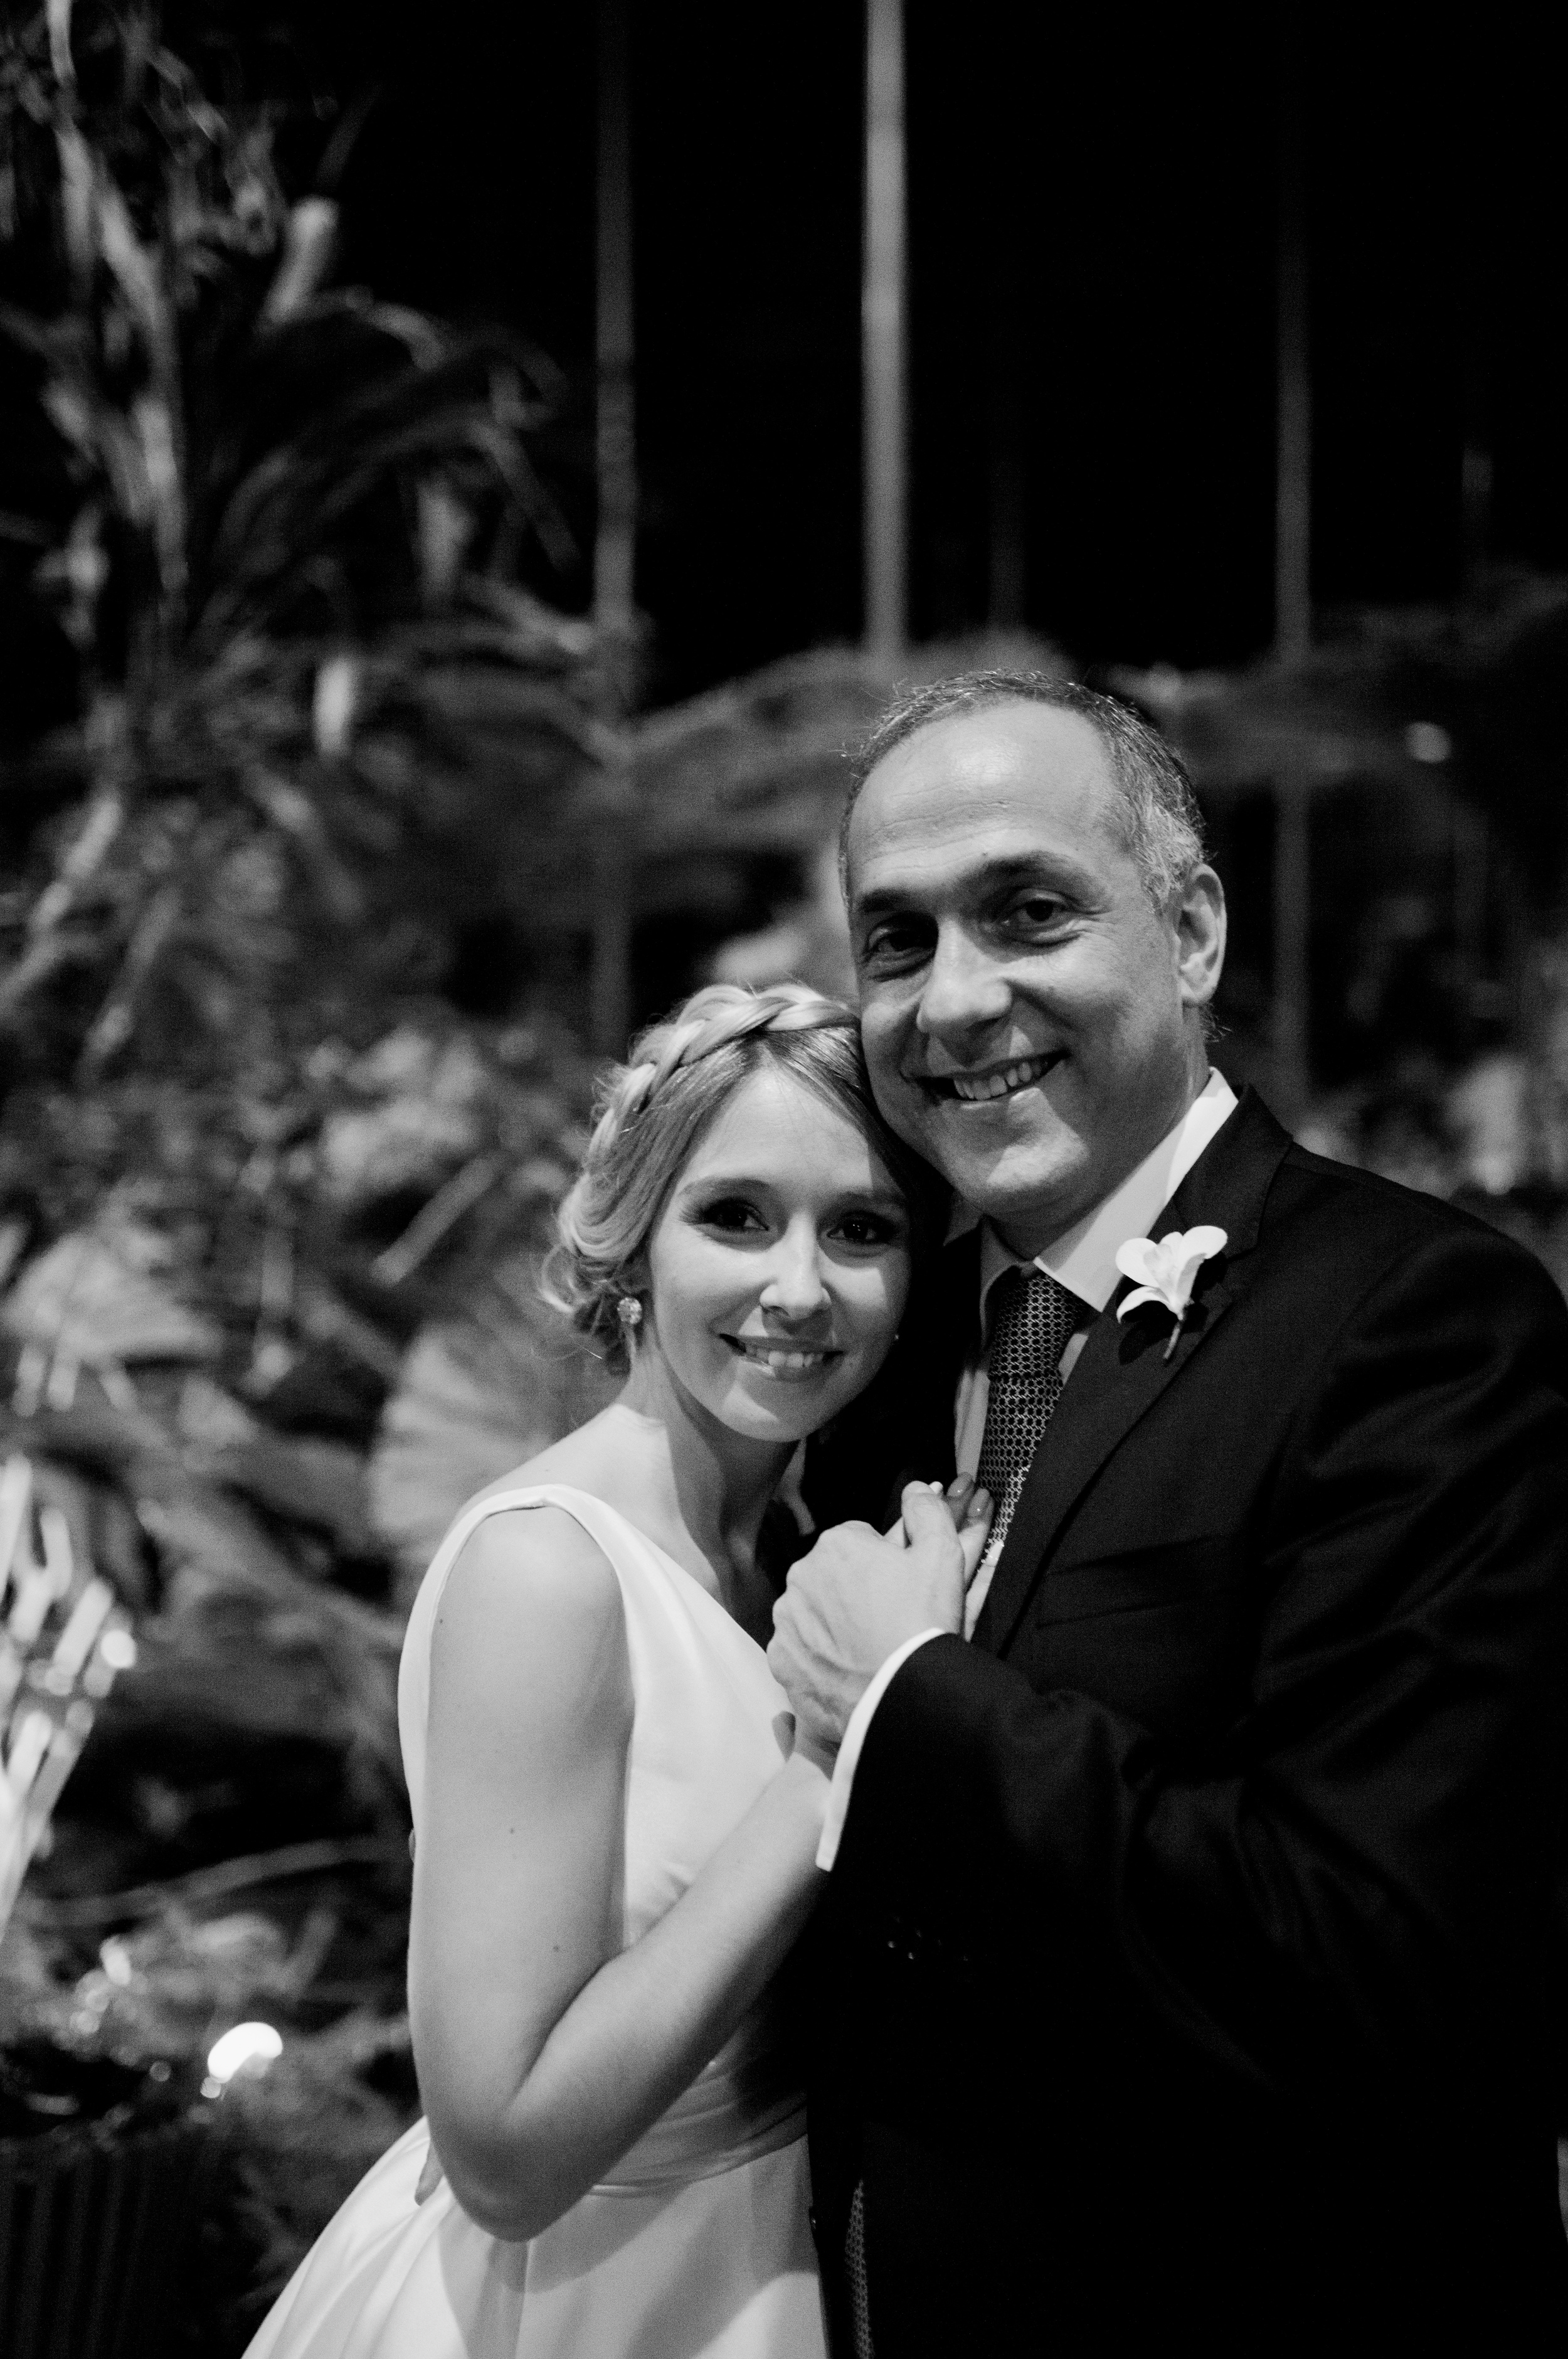 mariarao+wedding+estufa+fria-463.jpg